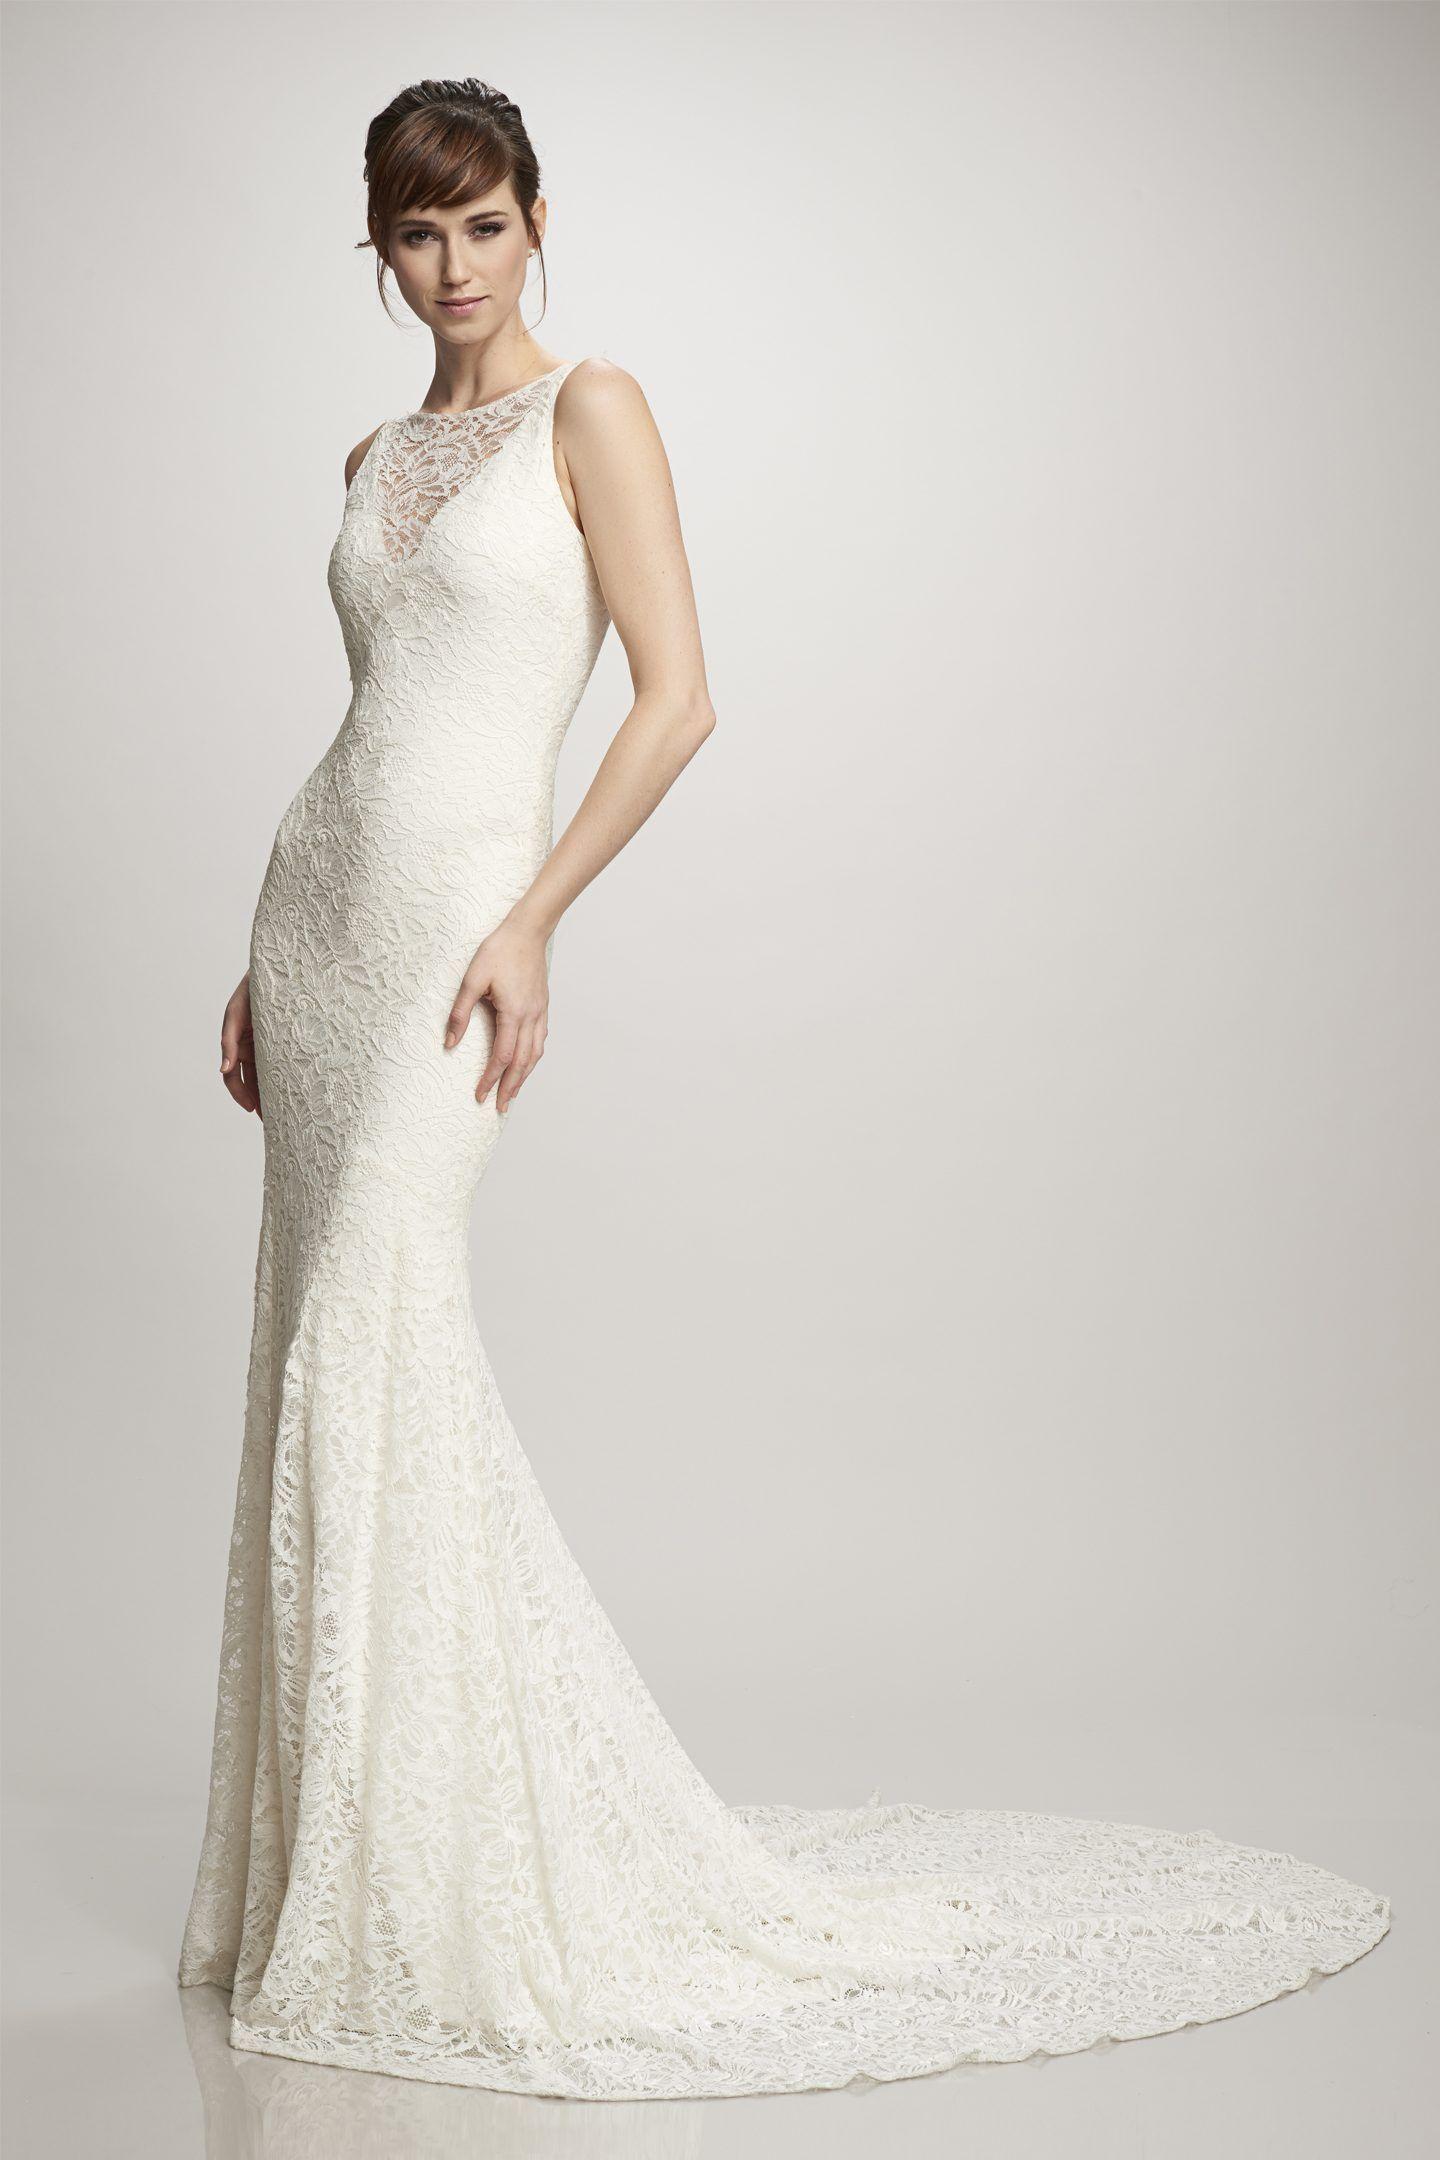 Theia wedding dresses  Daphne u THEIA Bridal  Wedding Attire  Pinterest  Theia bridal